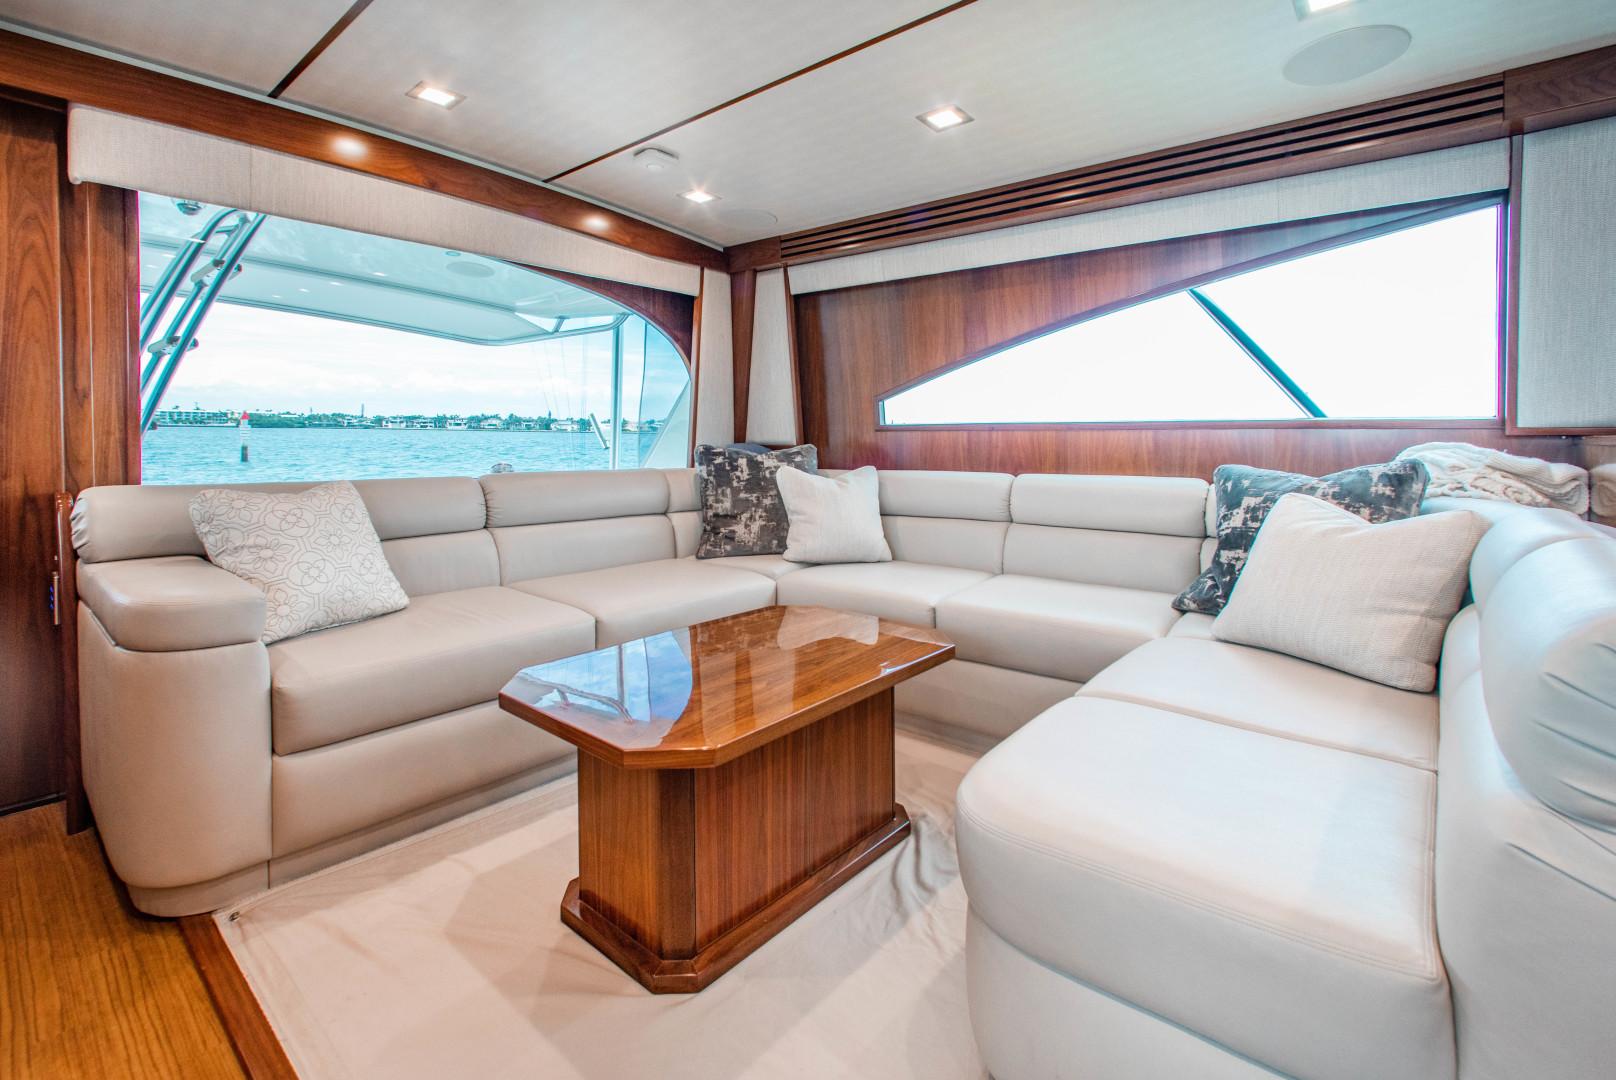 Viking-72 Enclosed Bridge 2018-Red Lion Ocean Reef-Florida-United States-2018 Viking 72 Enclosed Bridge  Red Lion  Salon-1568240   Thumbnail